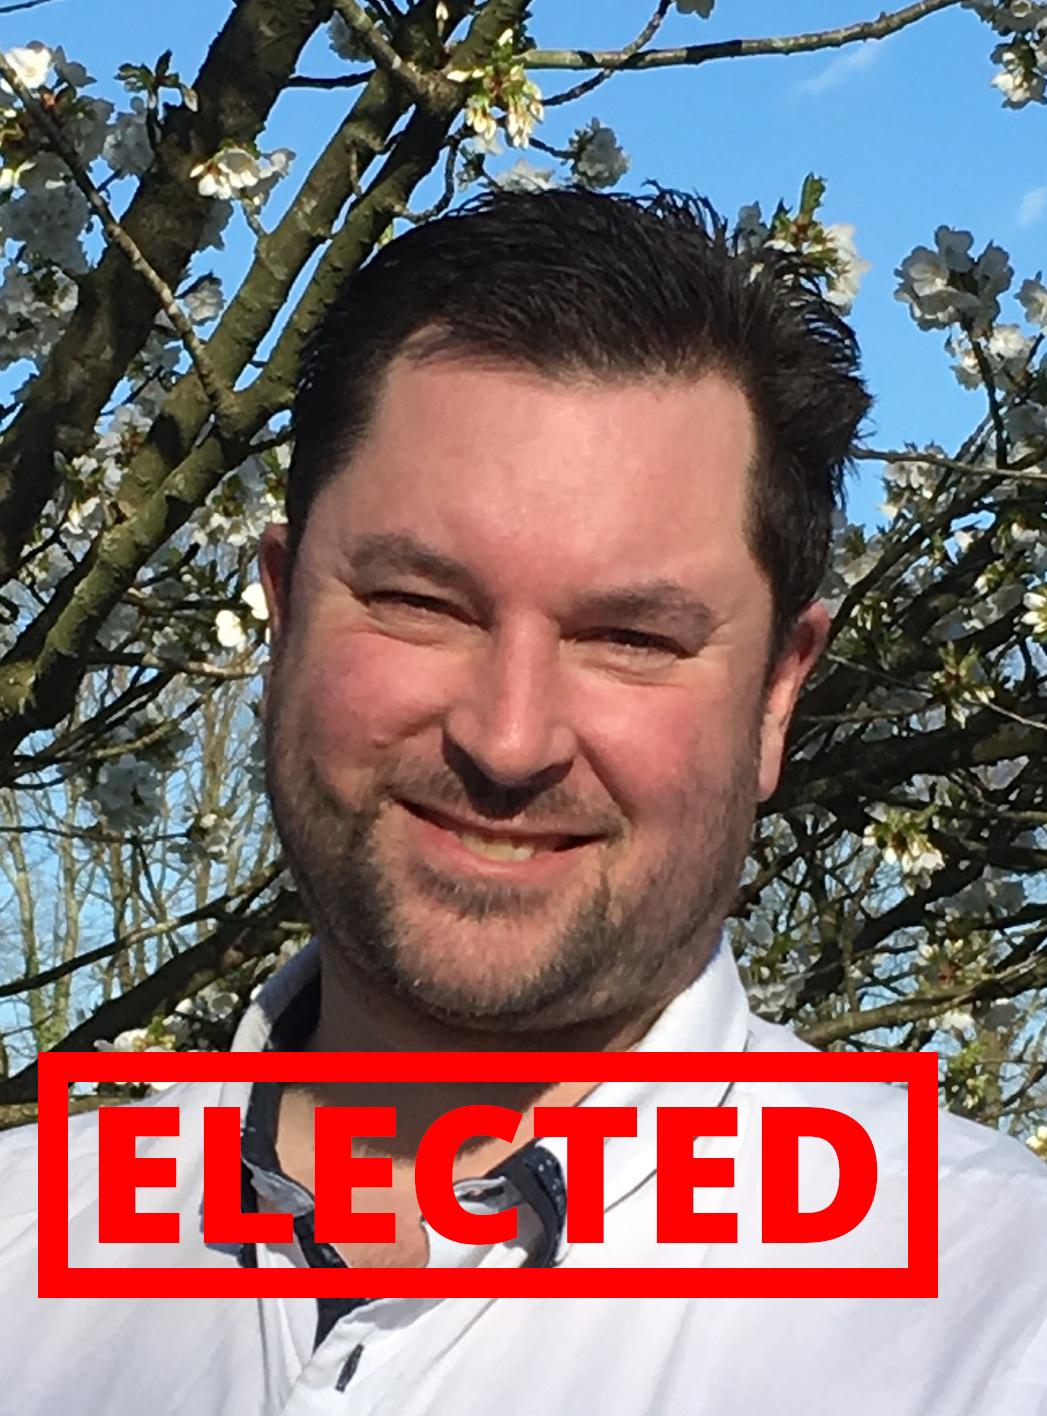 Jonathan Fern - elected!